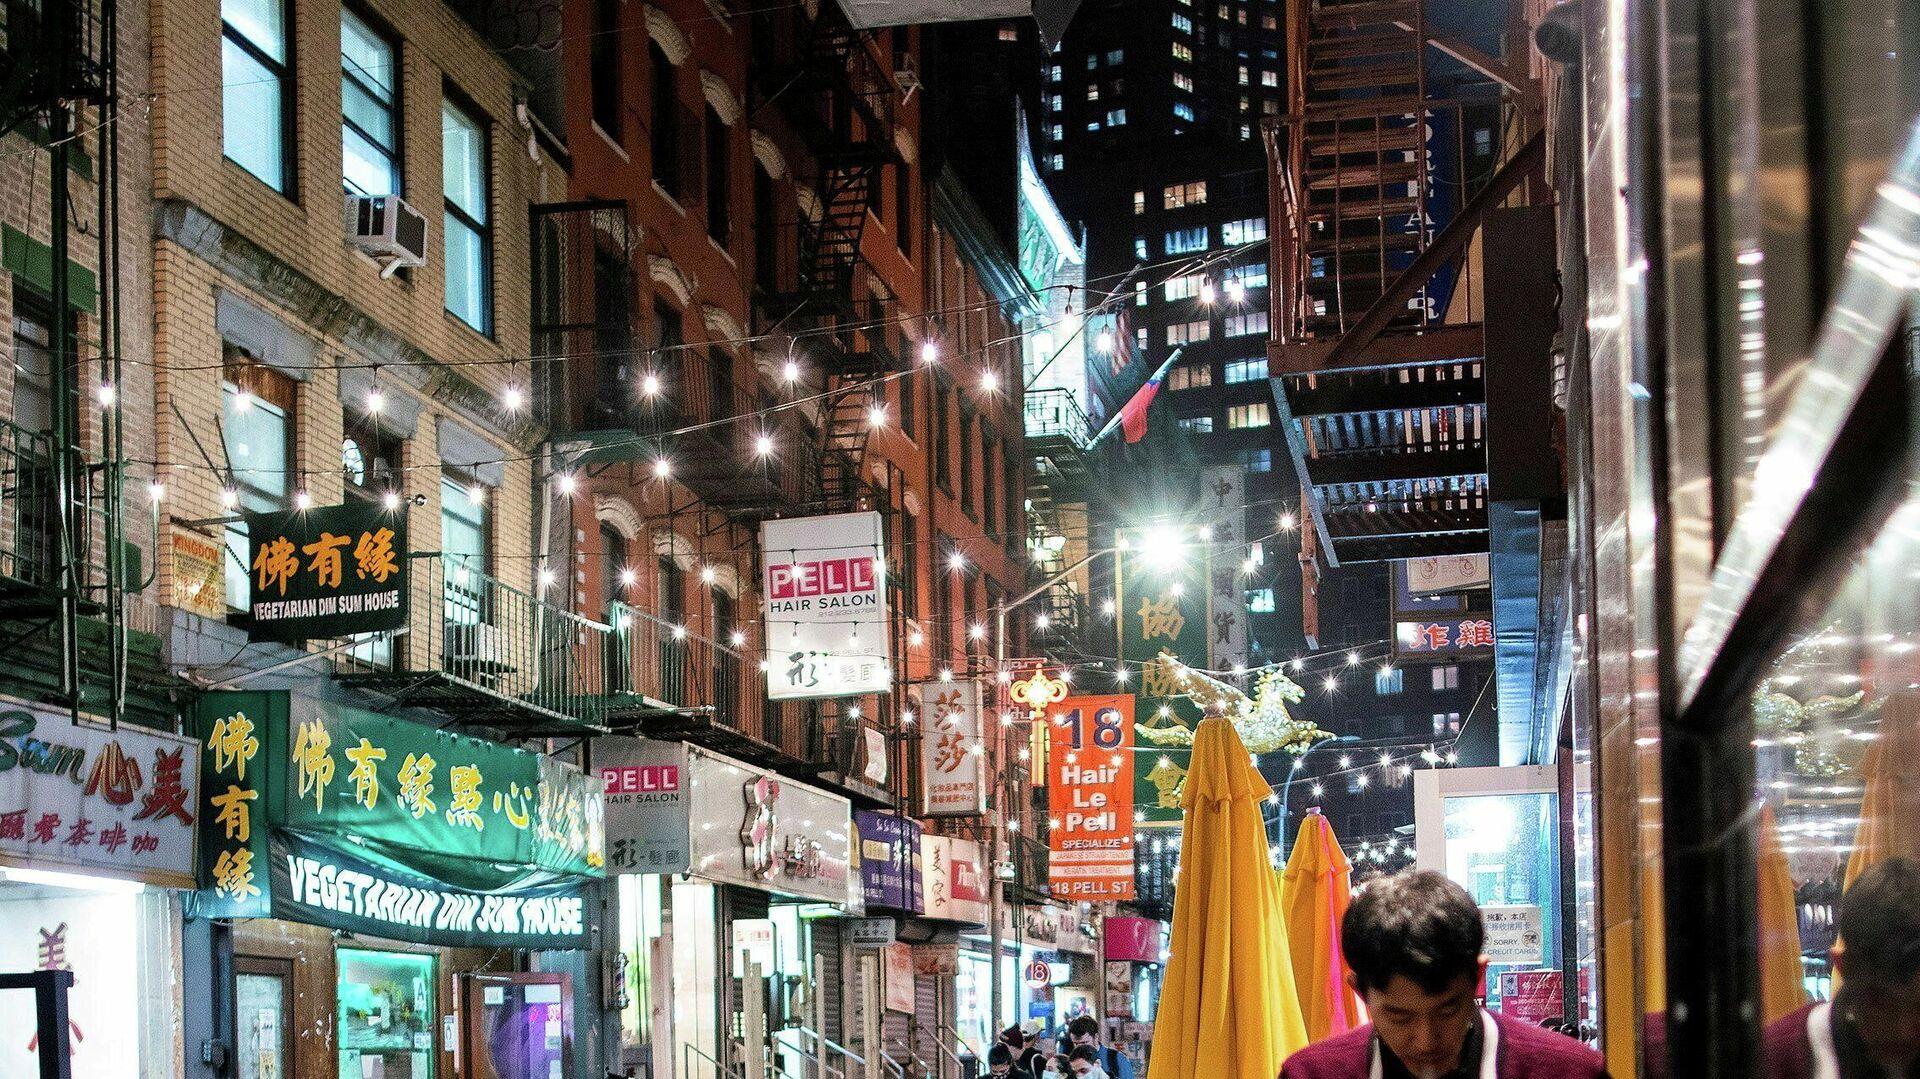 Chinatown en EEUU (imagen referencial) - Sputnik Mundo, 1920, 29.04.2021